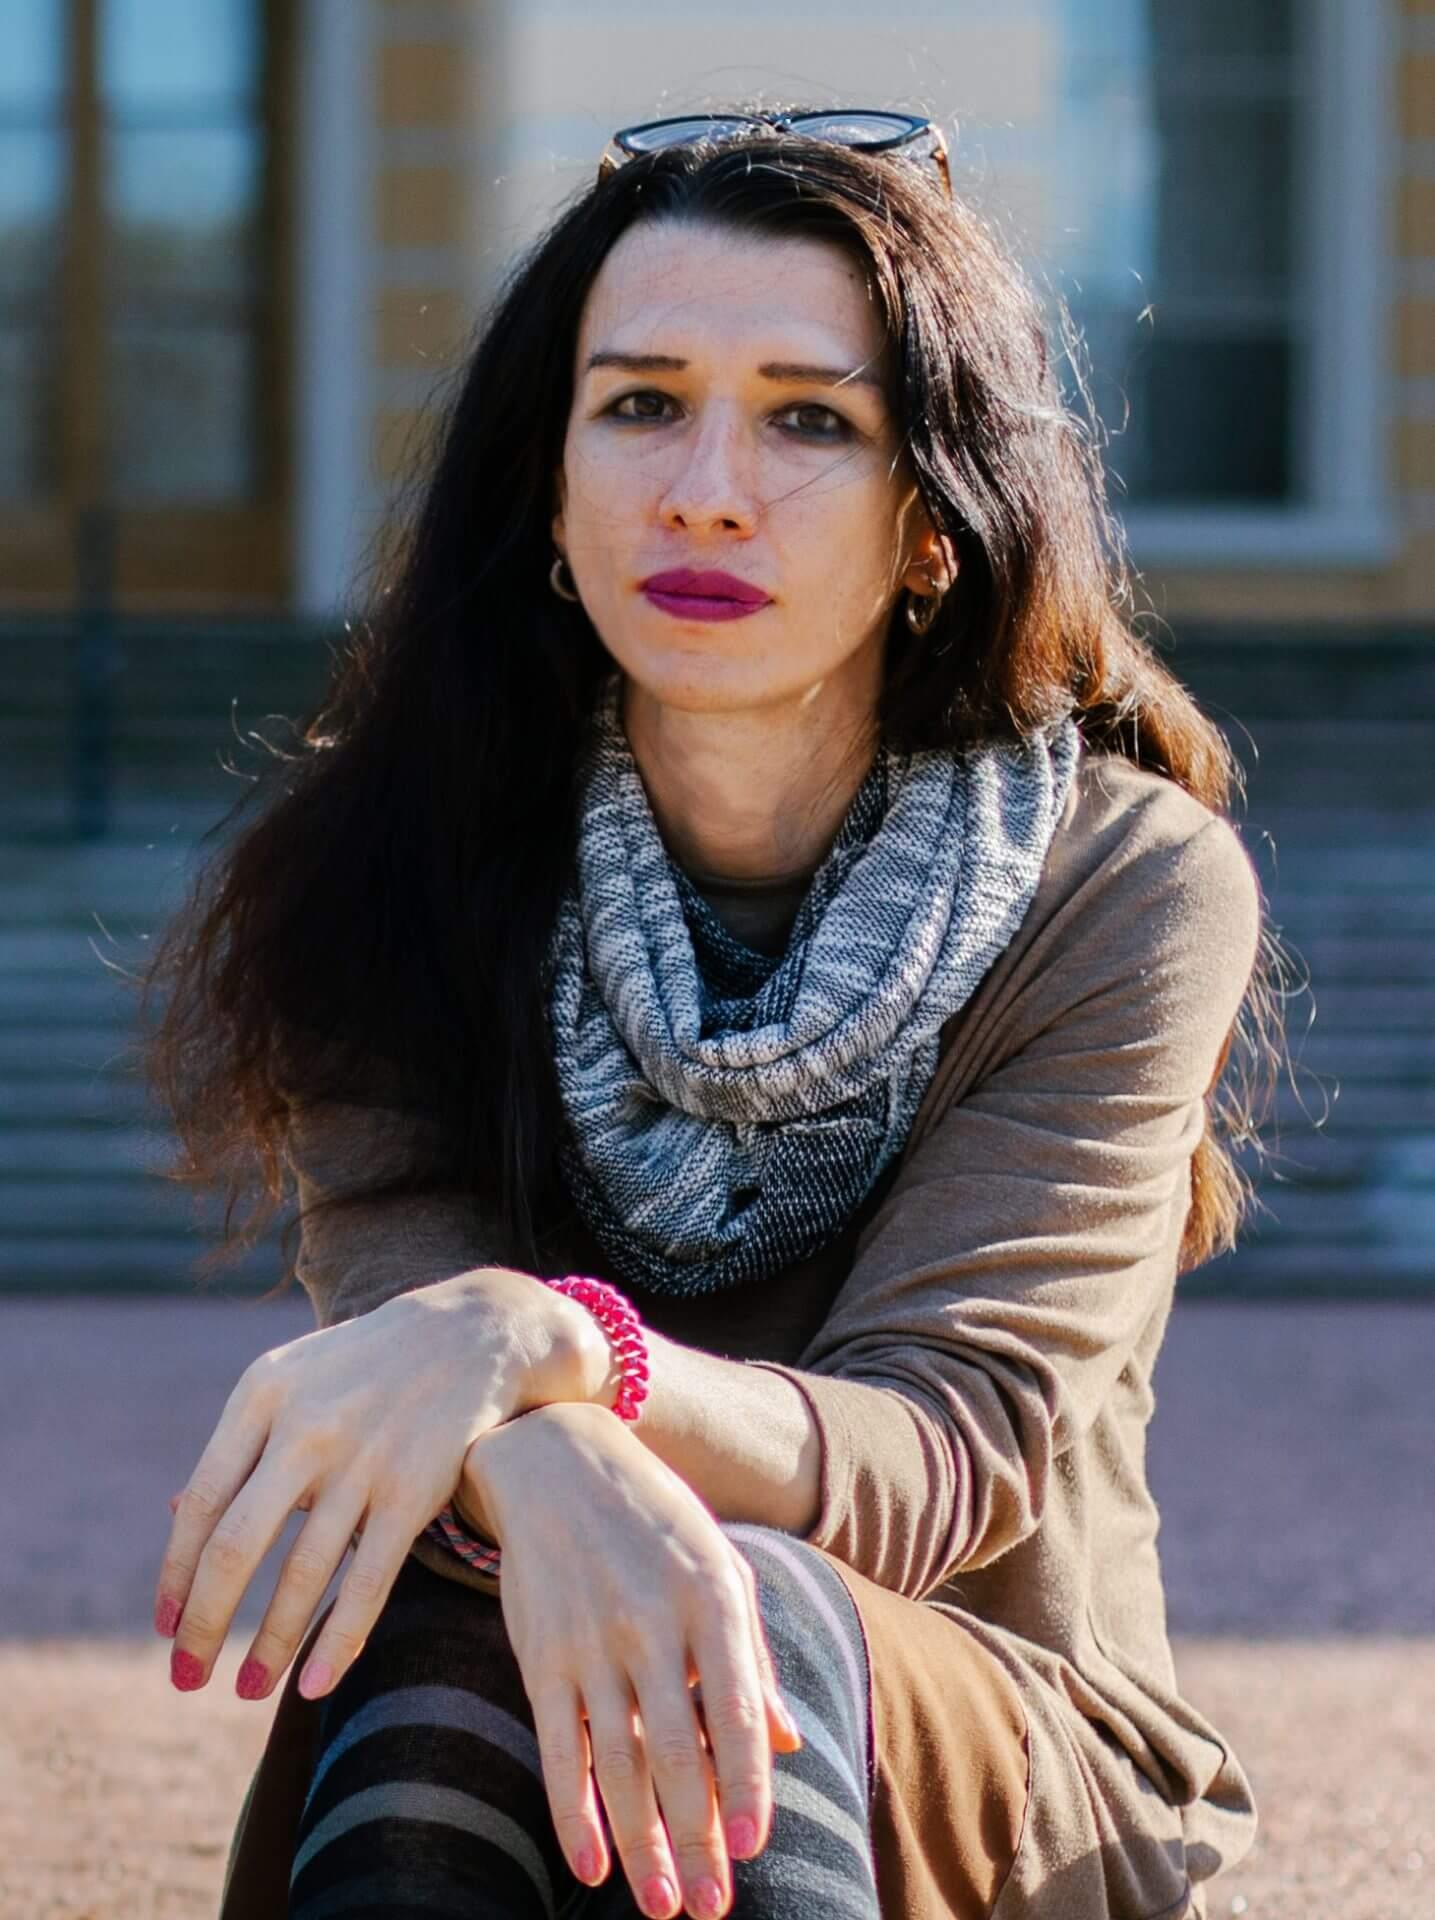 Rufija Dżenrbekowa (fot.Aleksandr Kuczerenko)